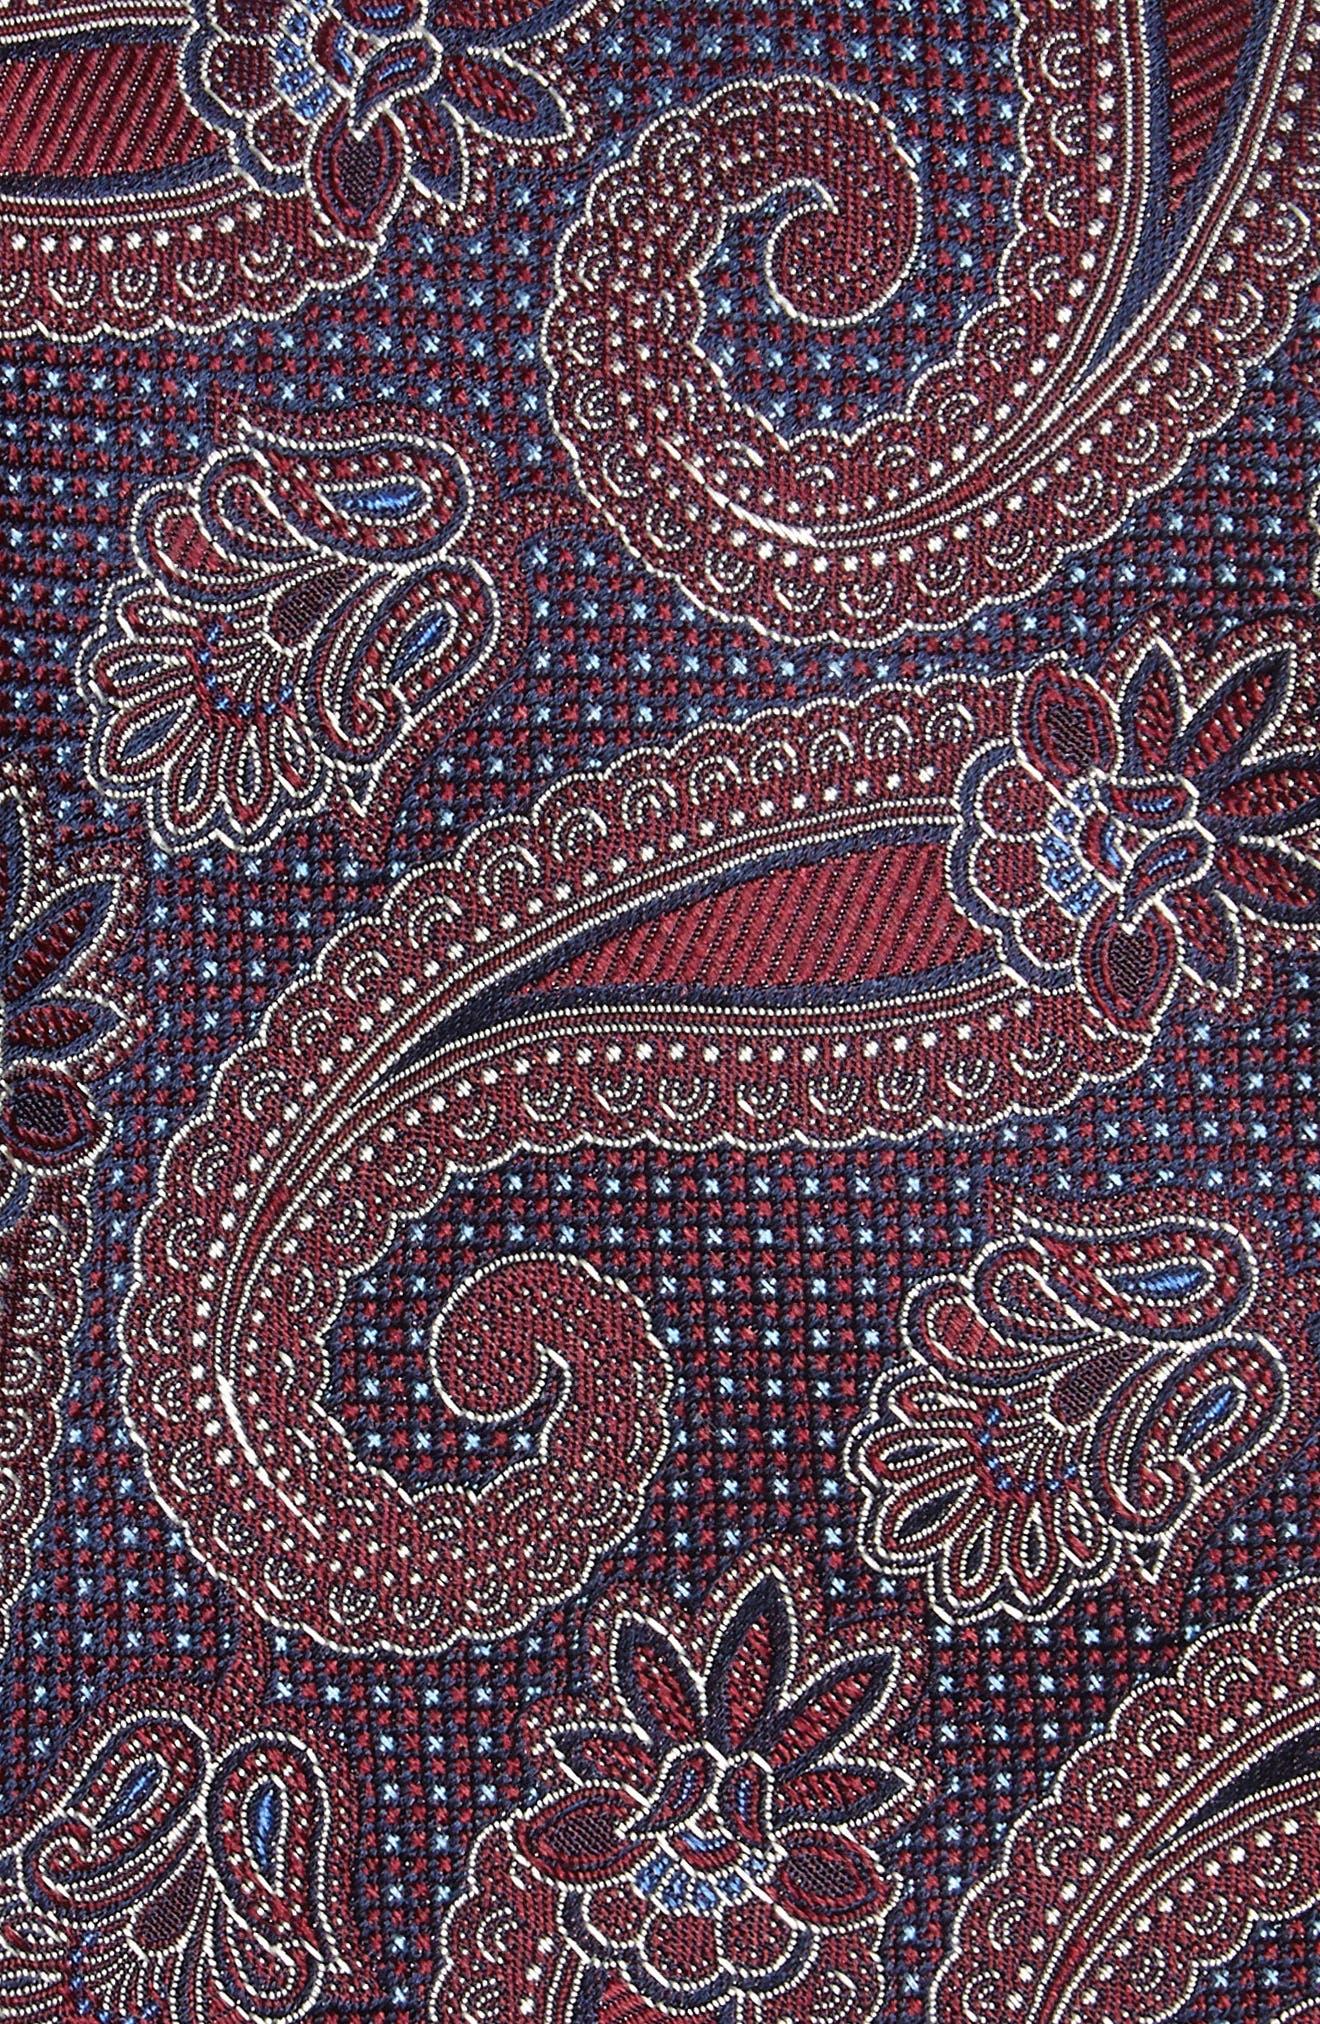 Emery Paisley Silk Tie,                             Alternate thumbnail 2, color,                             Burgundy